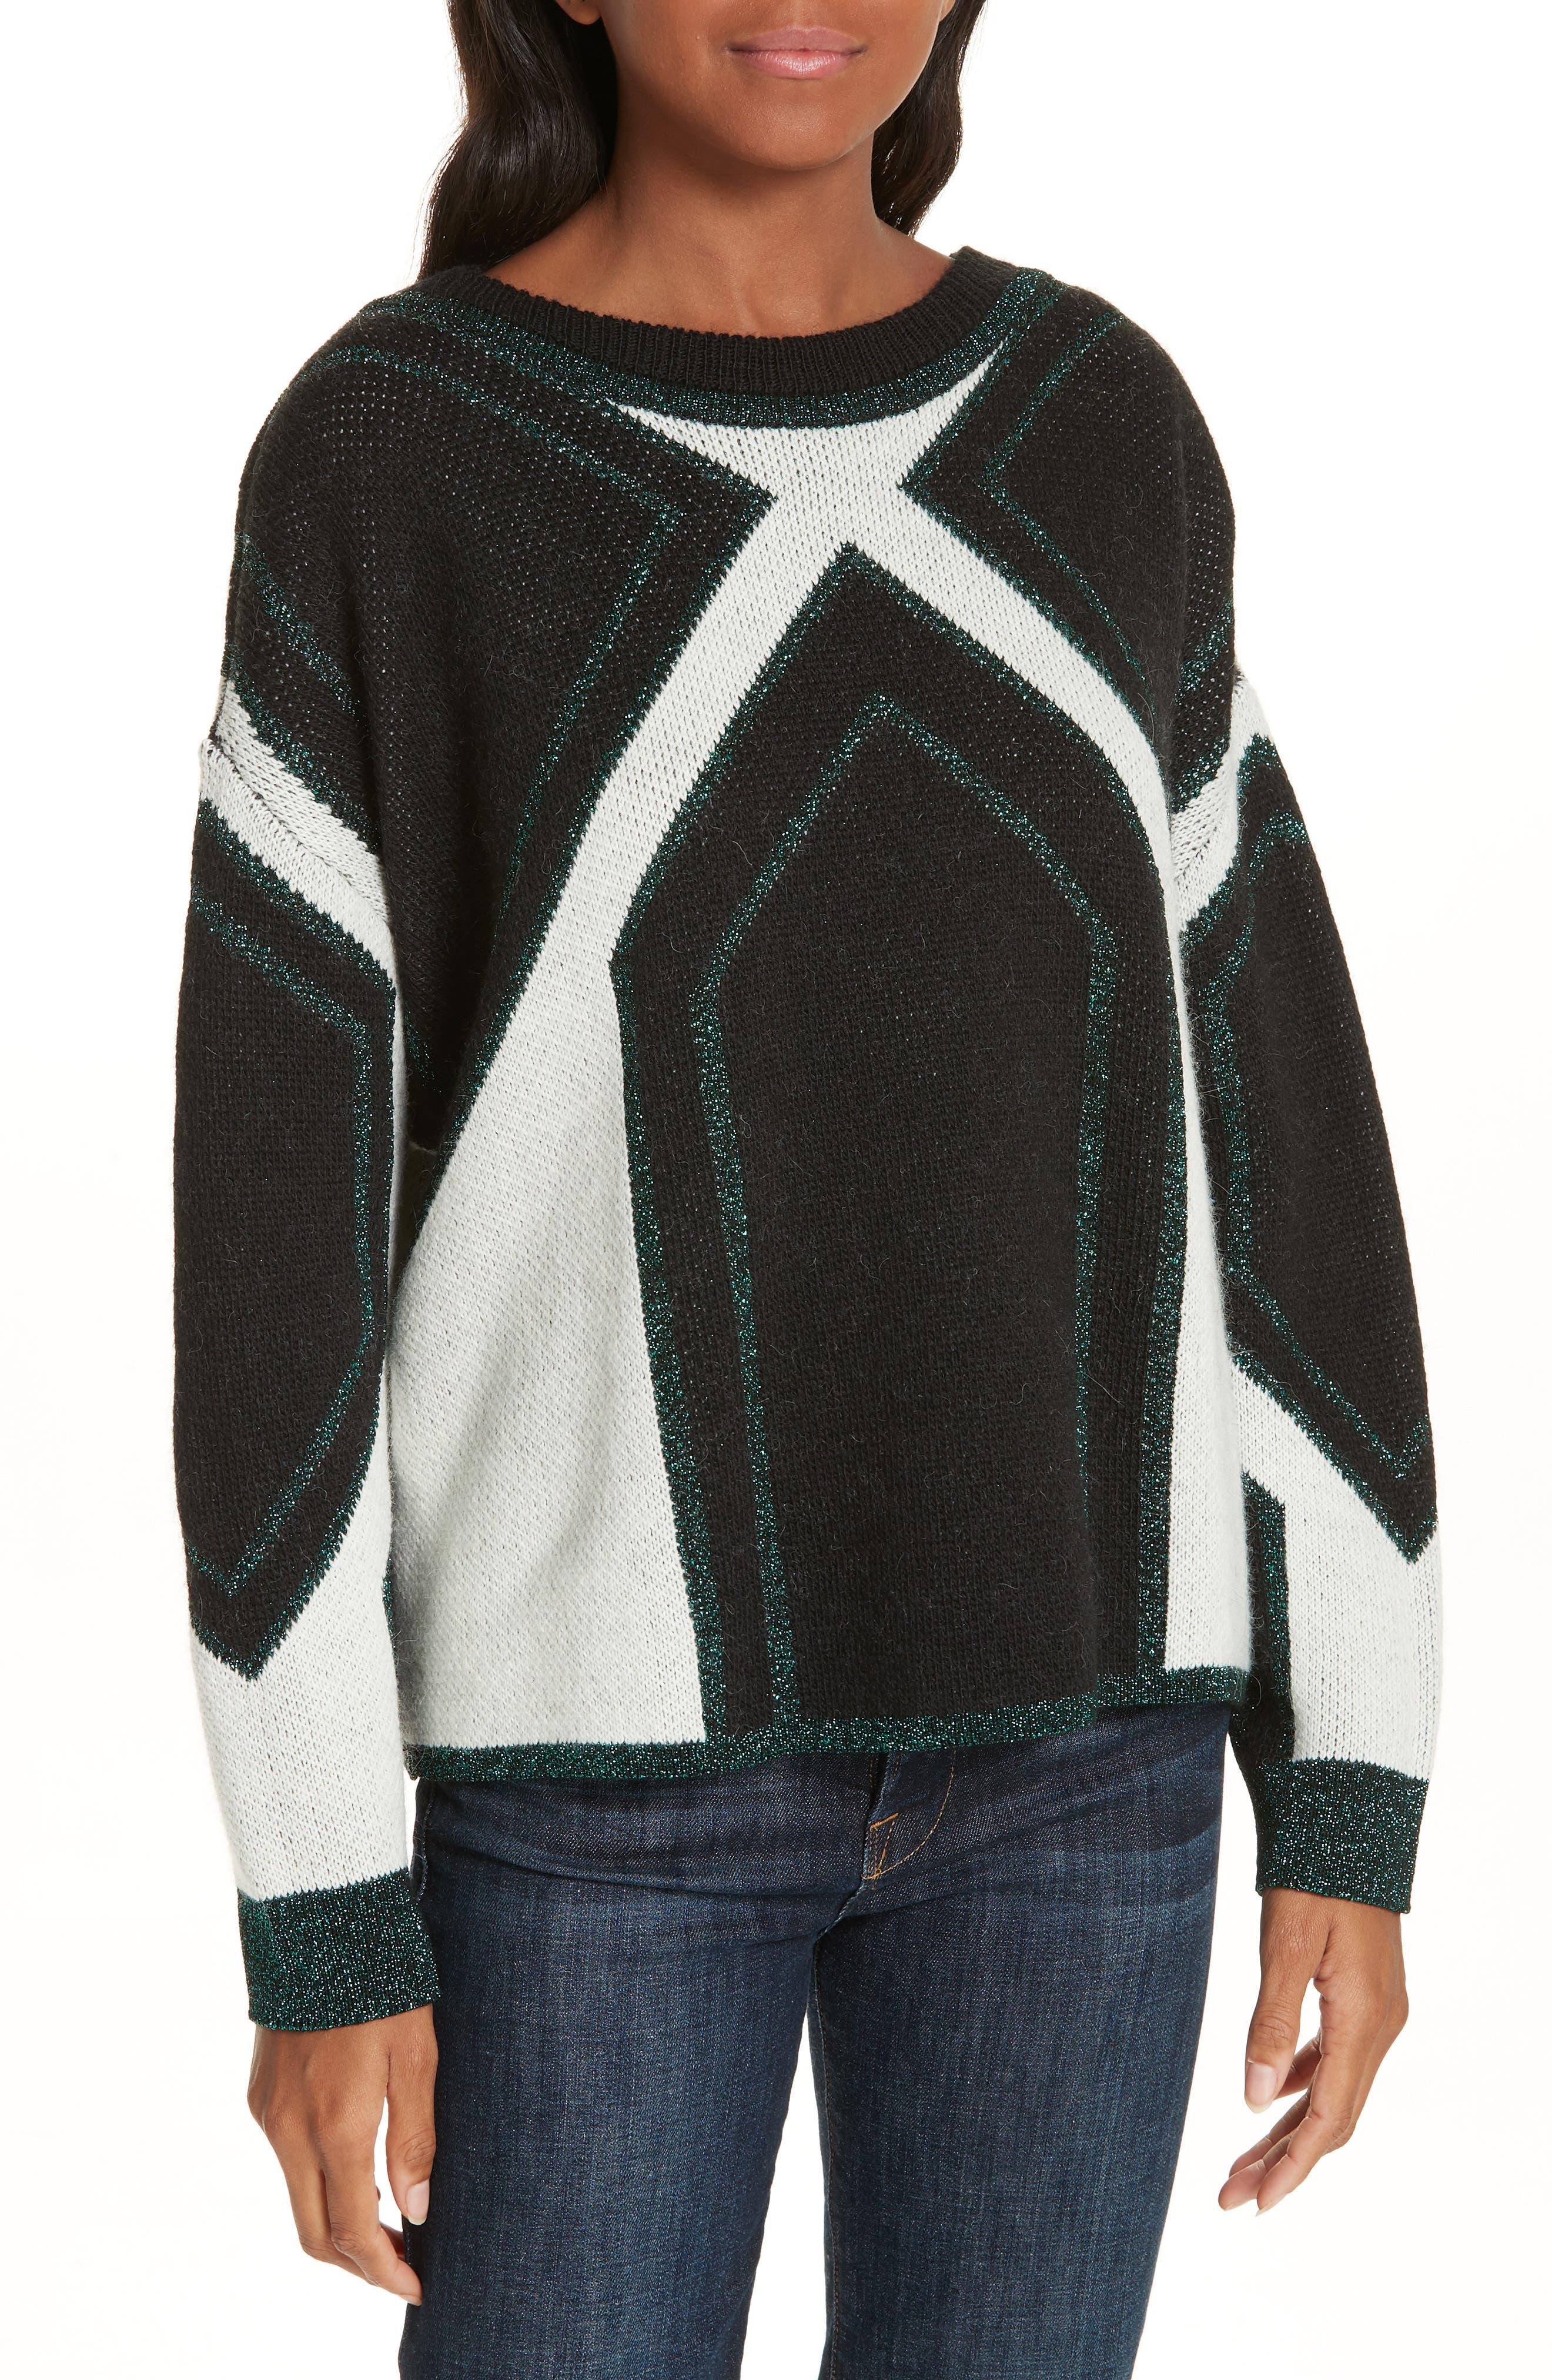 Velny Sweater,                             Main thumbnail 1, color,                             400